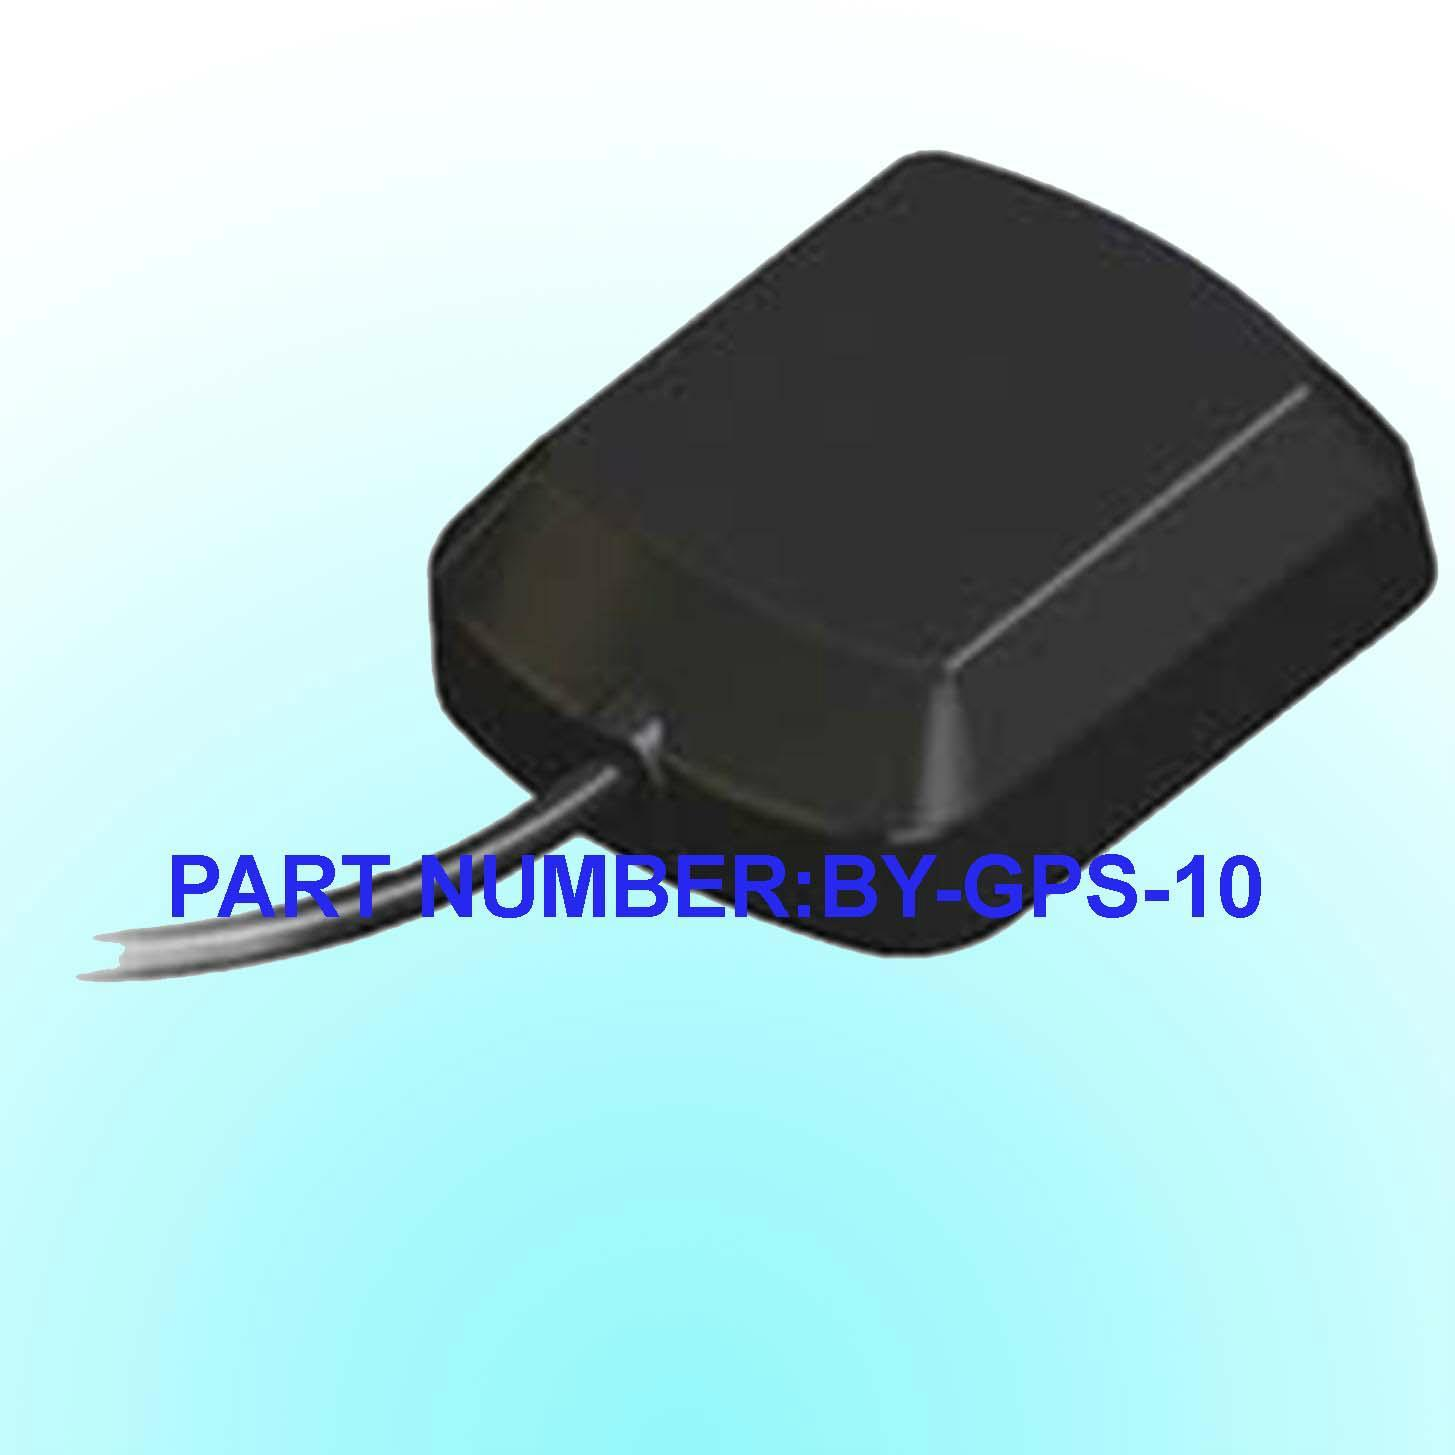 Good Quality High Gain Omni-Directional GPS Antenna